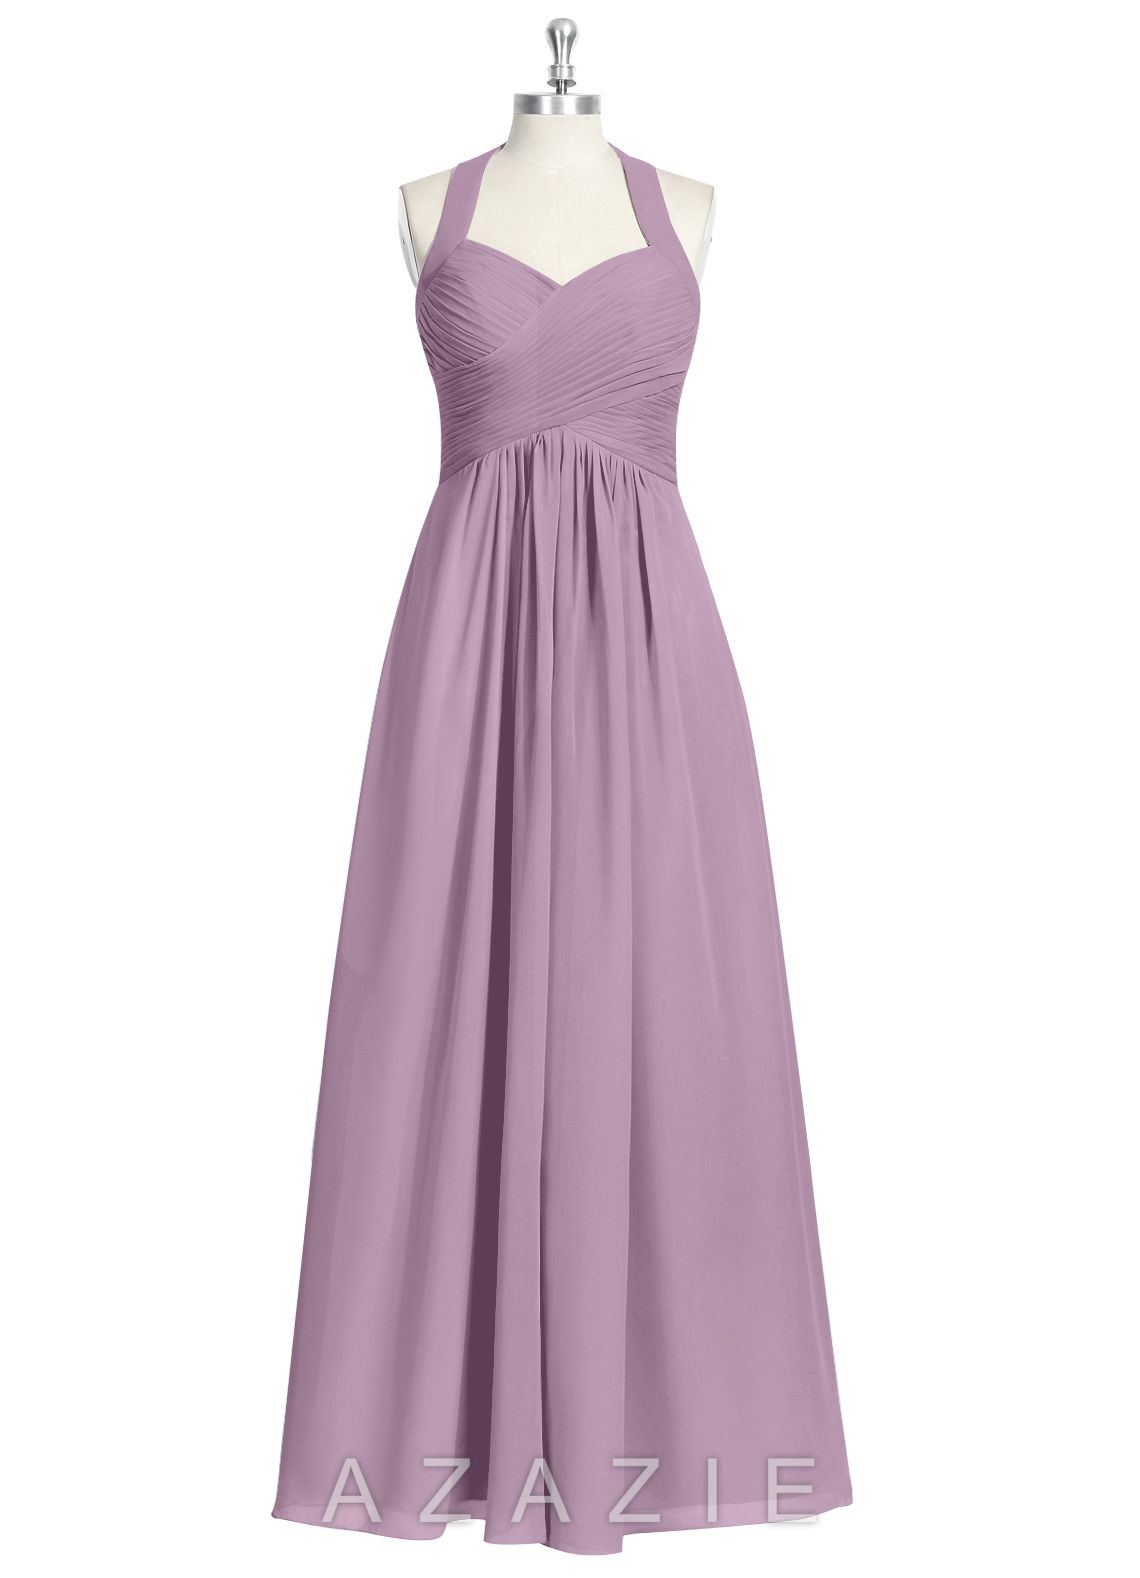 38+ Savannah wedding dress shops ideas